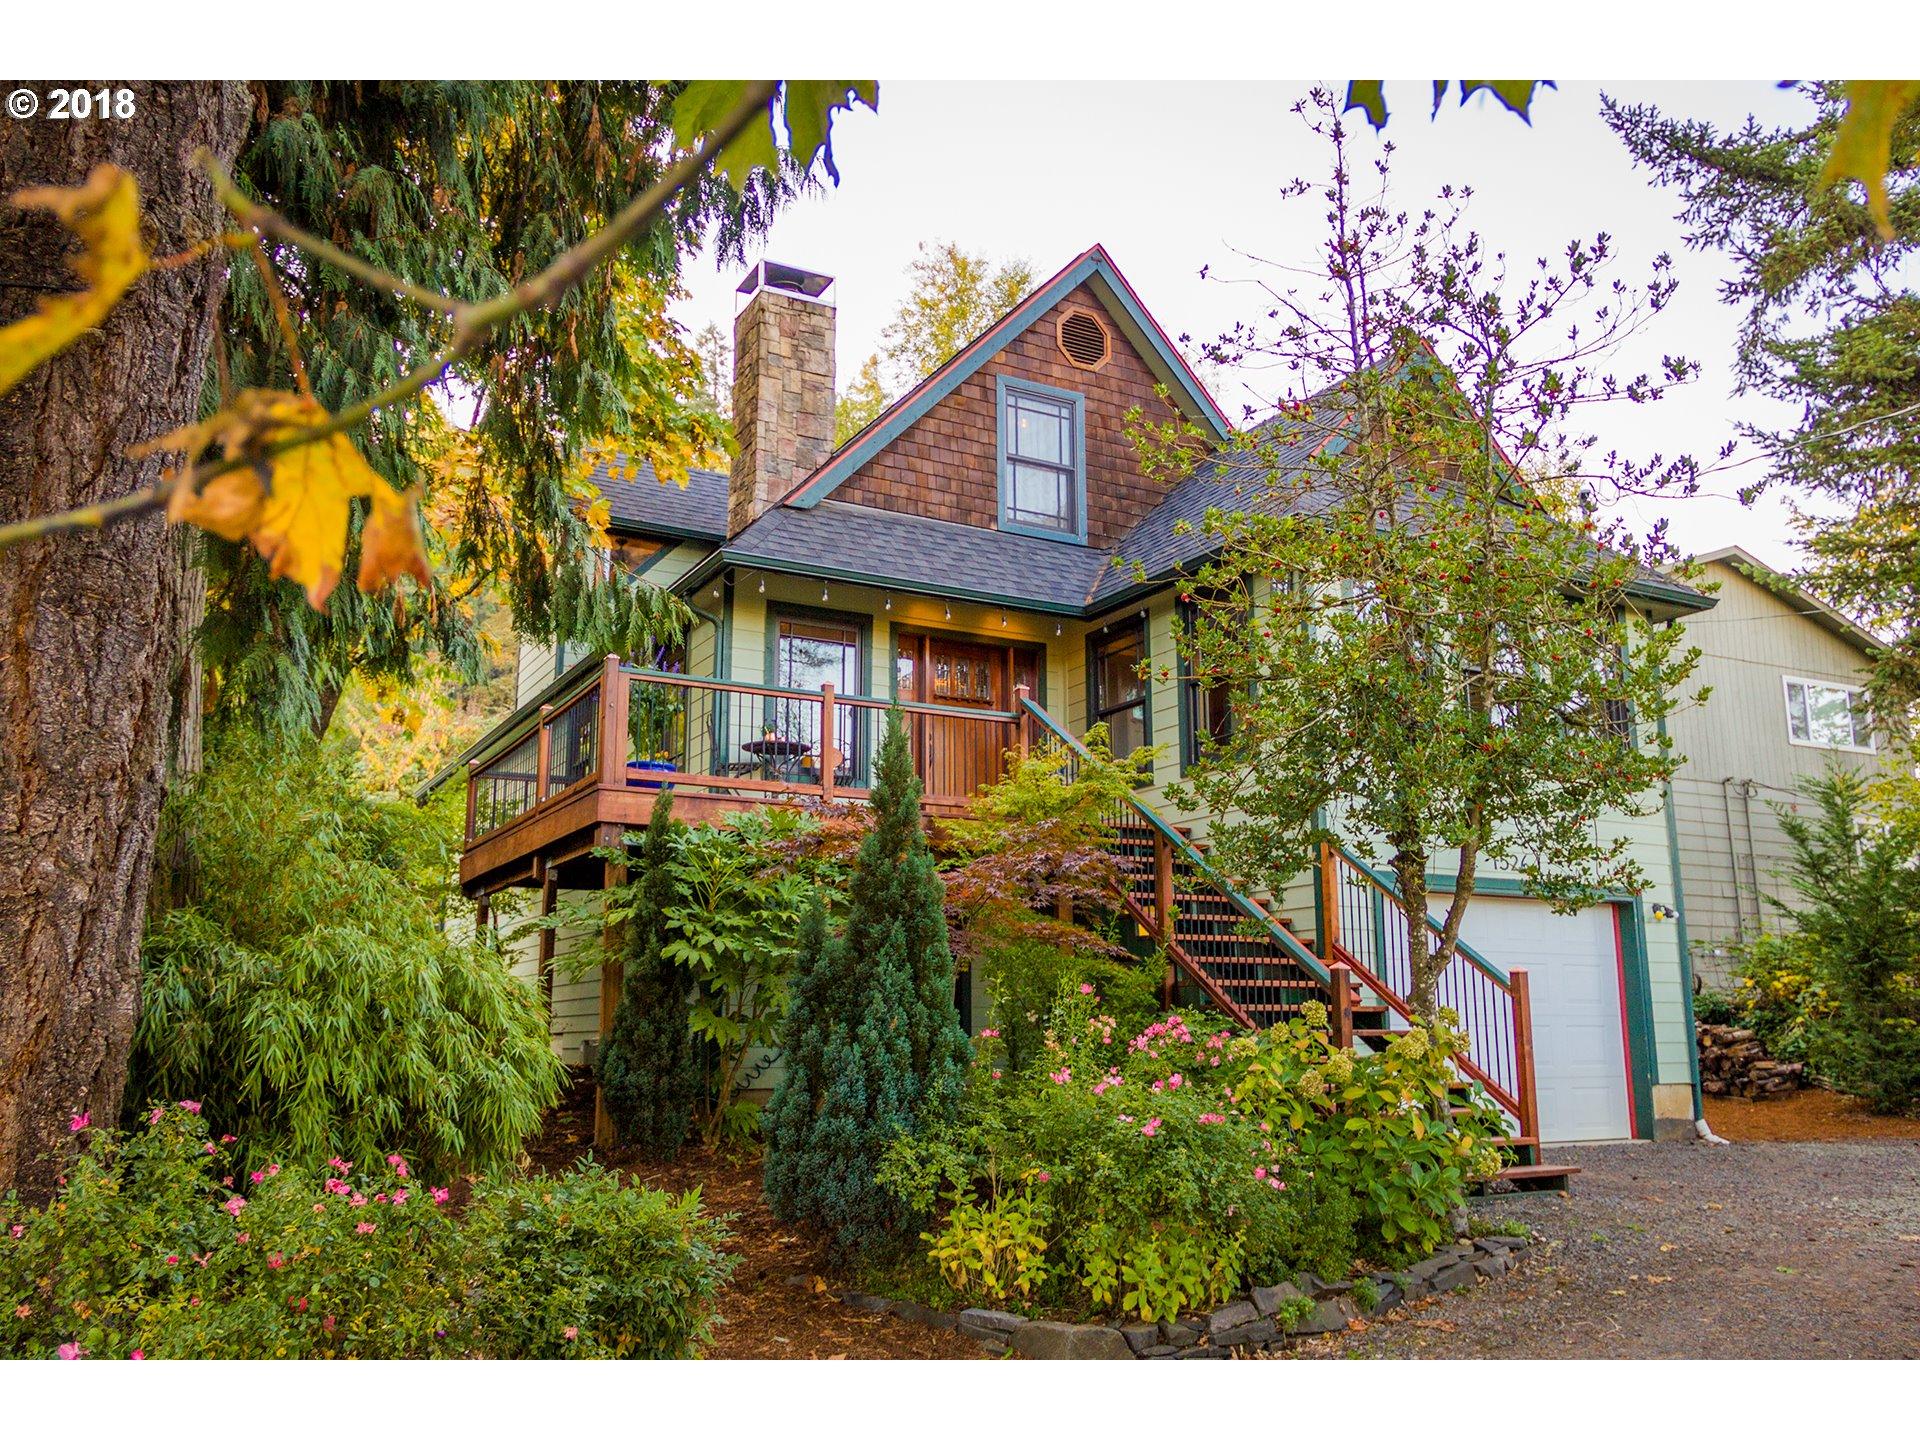 1526 RIVERVIEW ST Eugene, OR 97403 - MLS #: 18627162